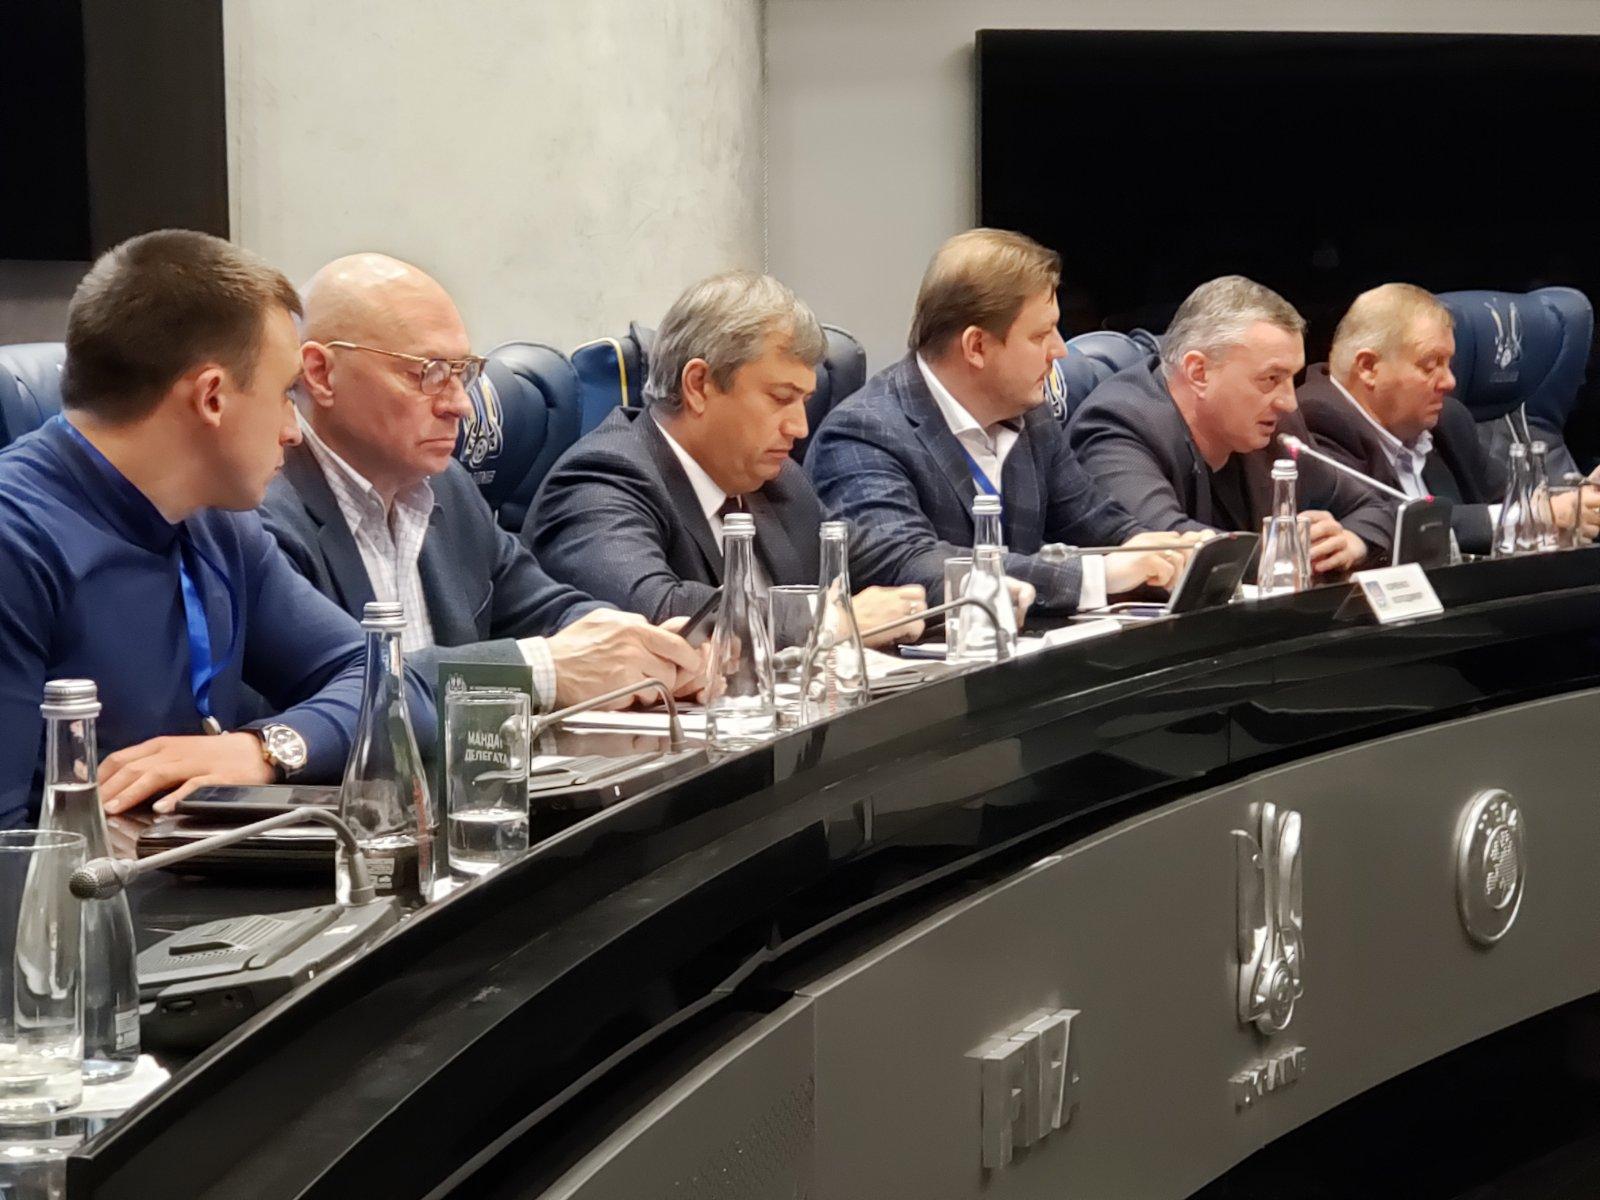 Київська обласна федерація футболу стала асоціацією -  - yzobrazhenye viber 2020 01 18 17 07 00